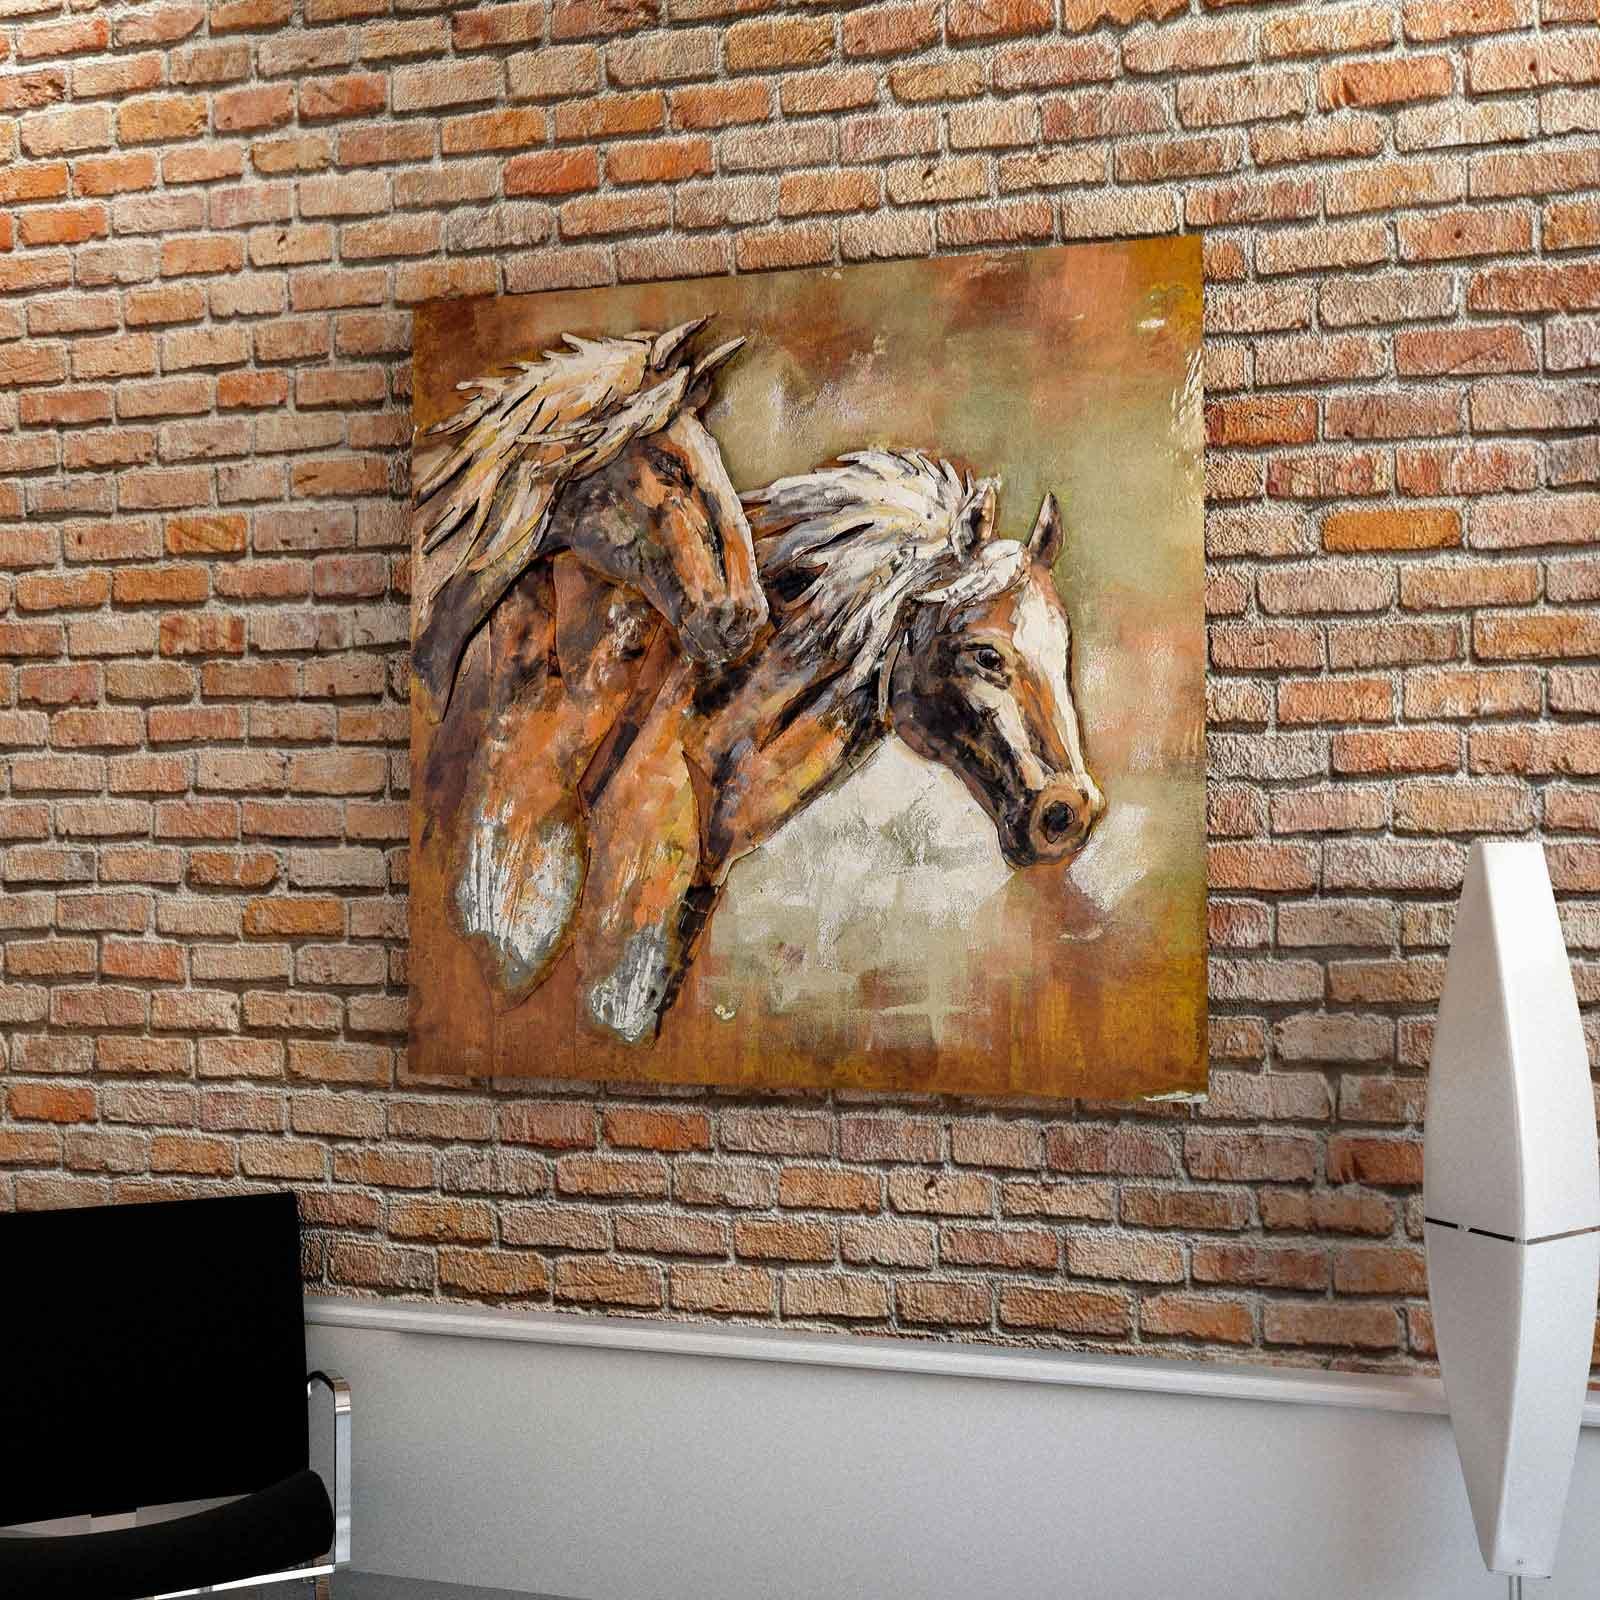 Wandbild Metall 3d : 3d metallbild pferde wandbild 100 x 100 cm metall bild wandrelief pferdekopf ebay ~ Watch28wear.com Haus und Dekorationen